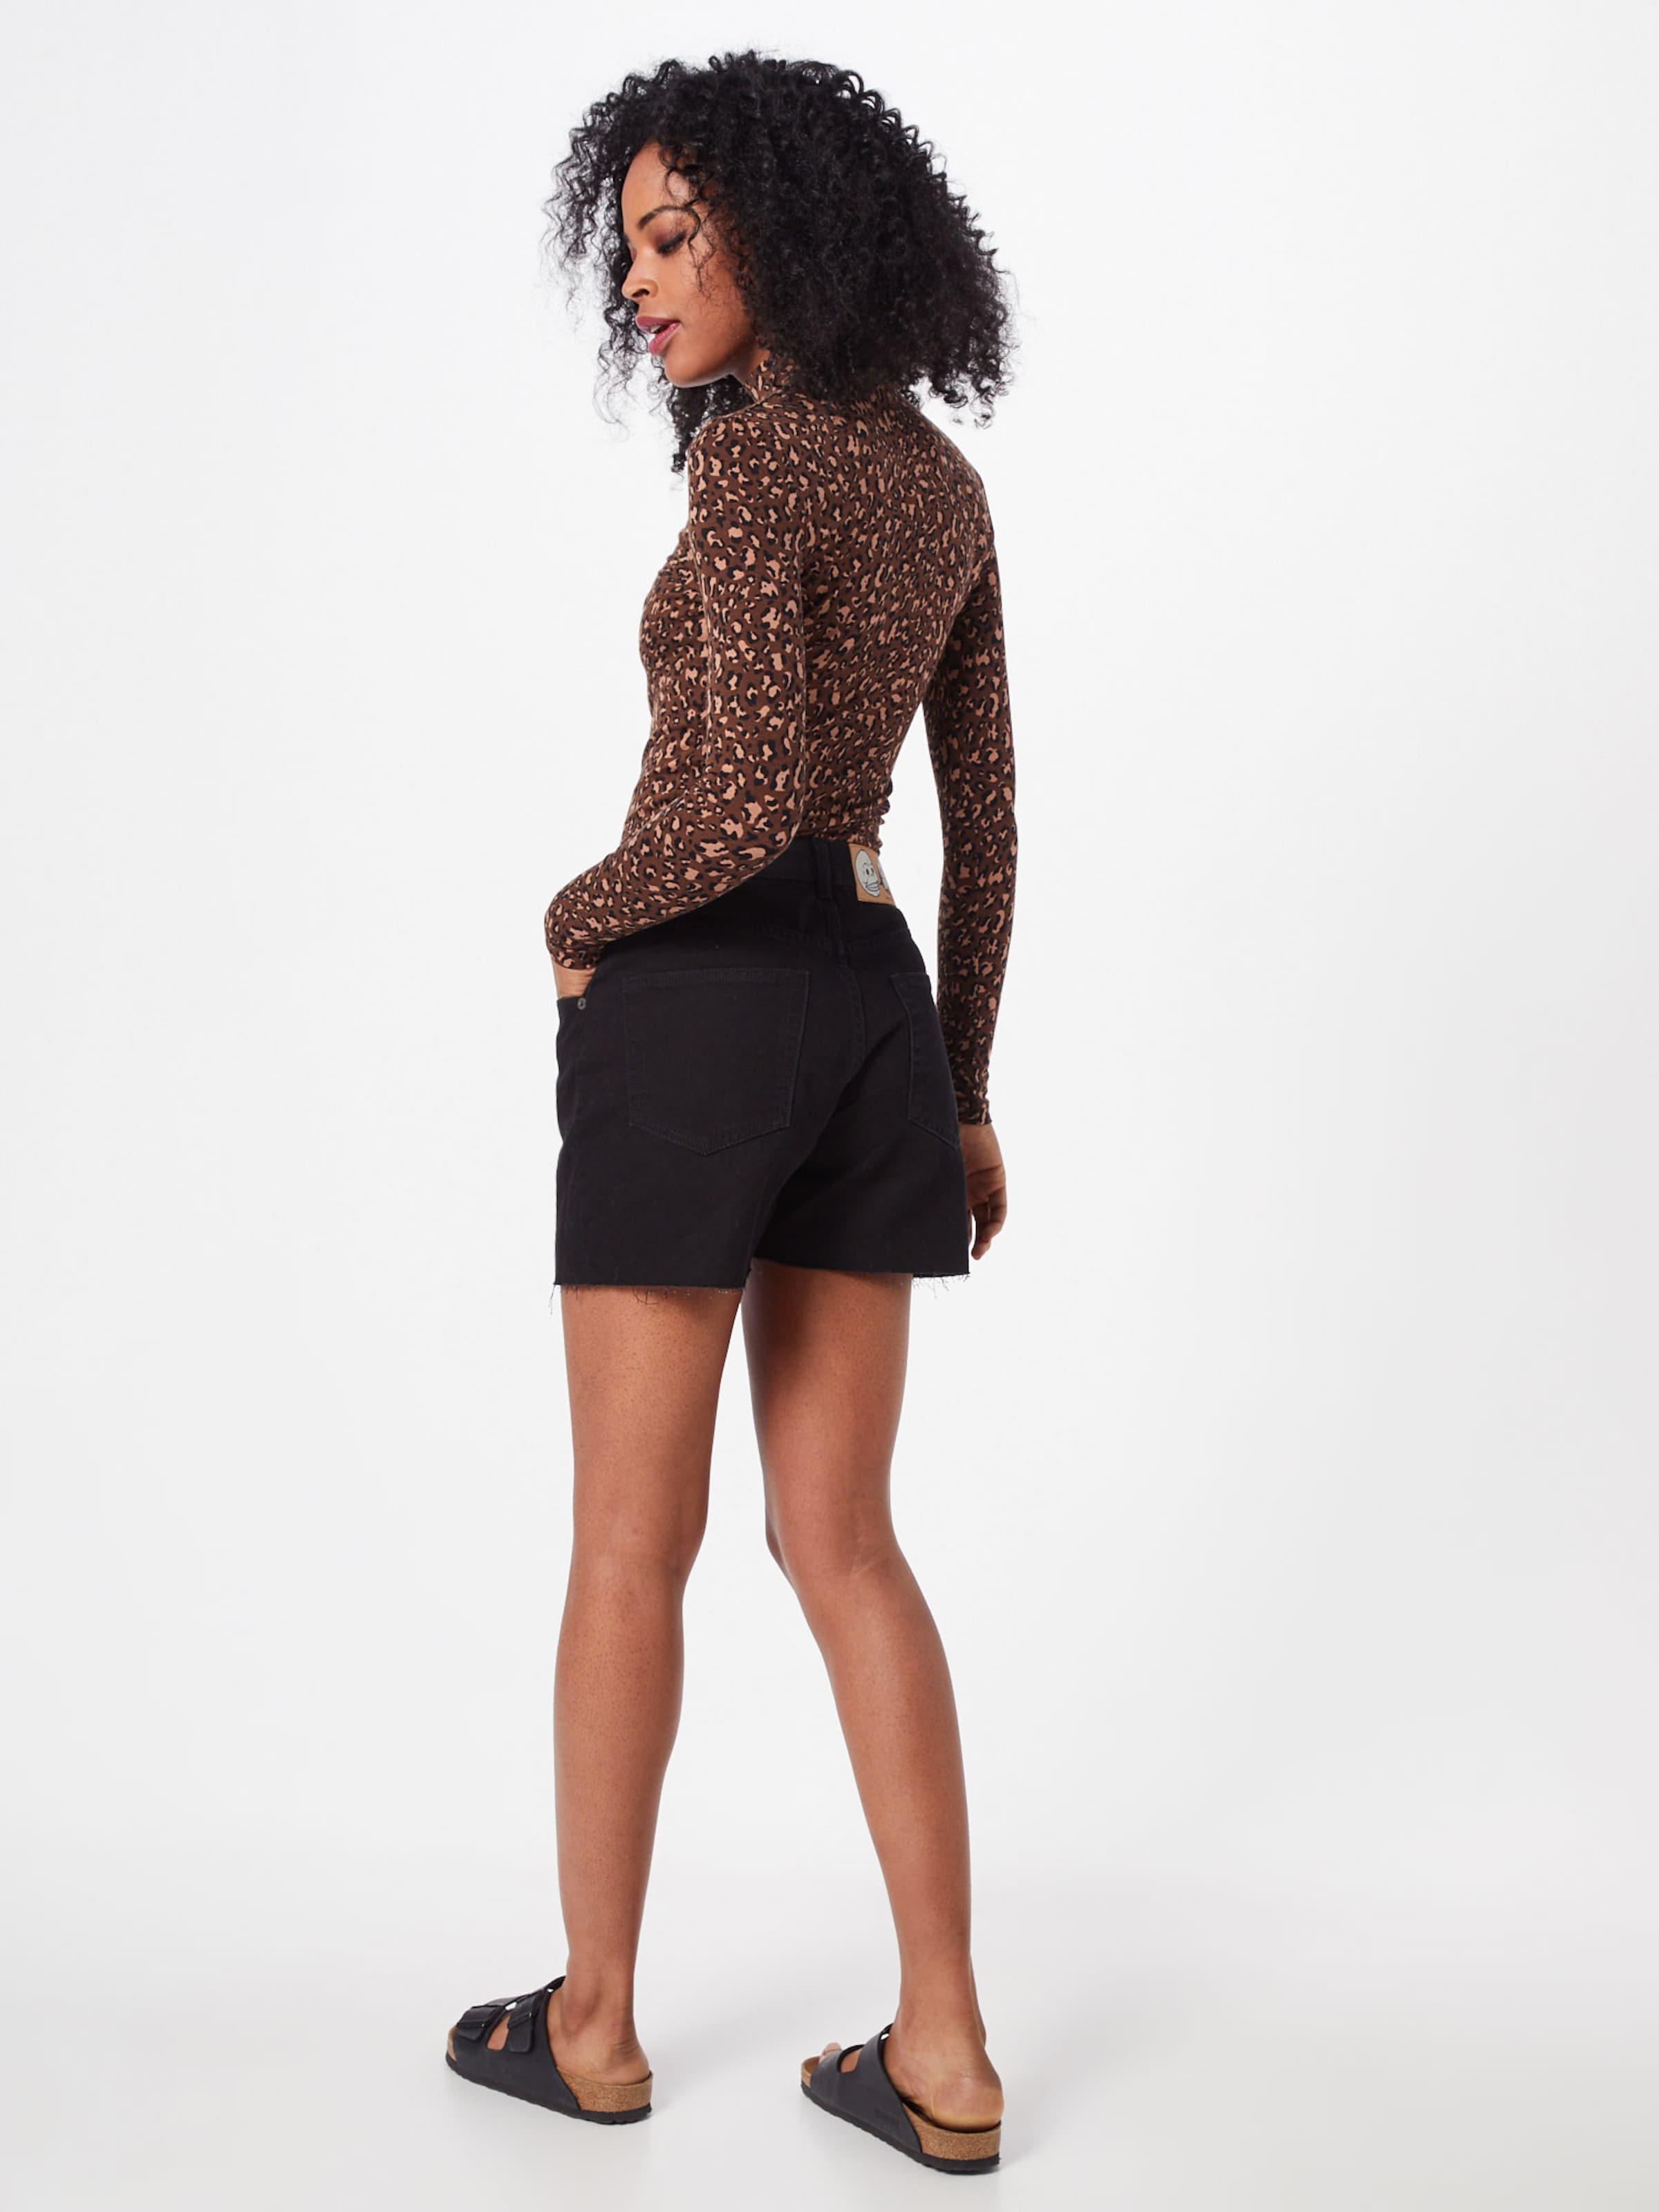 Cheap In Schwarz Monday 'donna' Jeansshorts rdEBeoxQCW